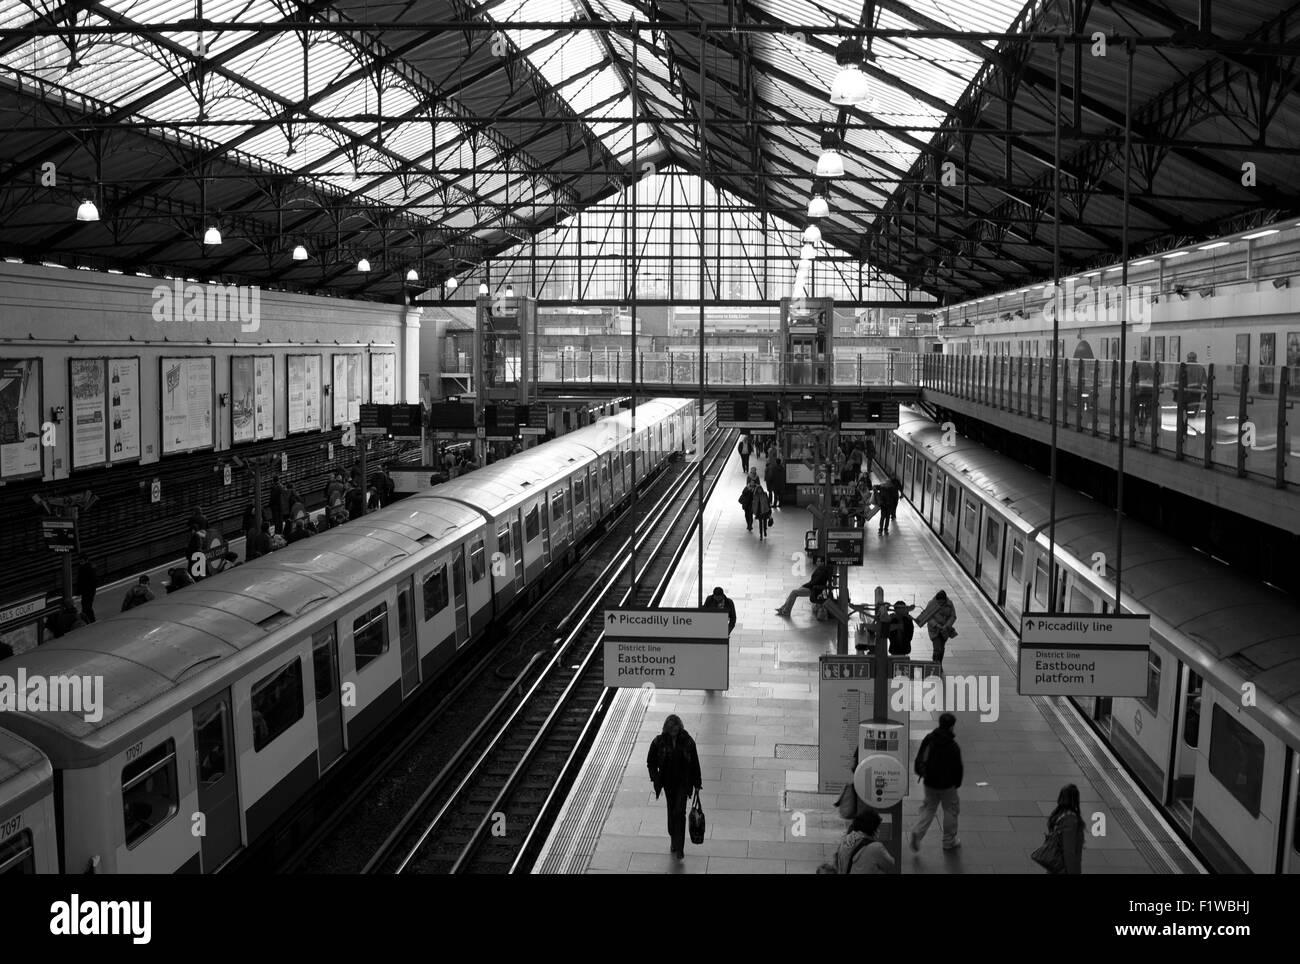 Earls Court tube station / London underground station Stock Photo